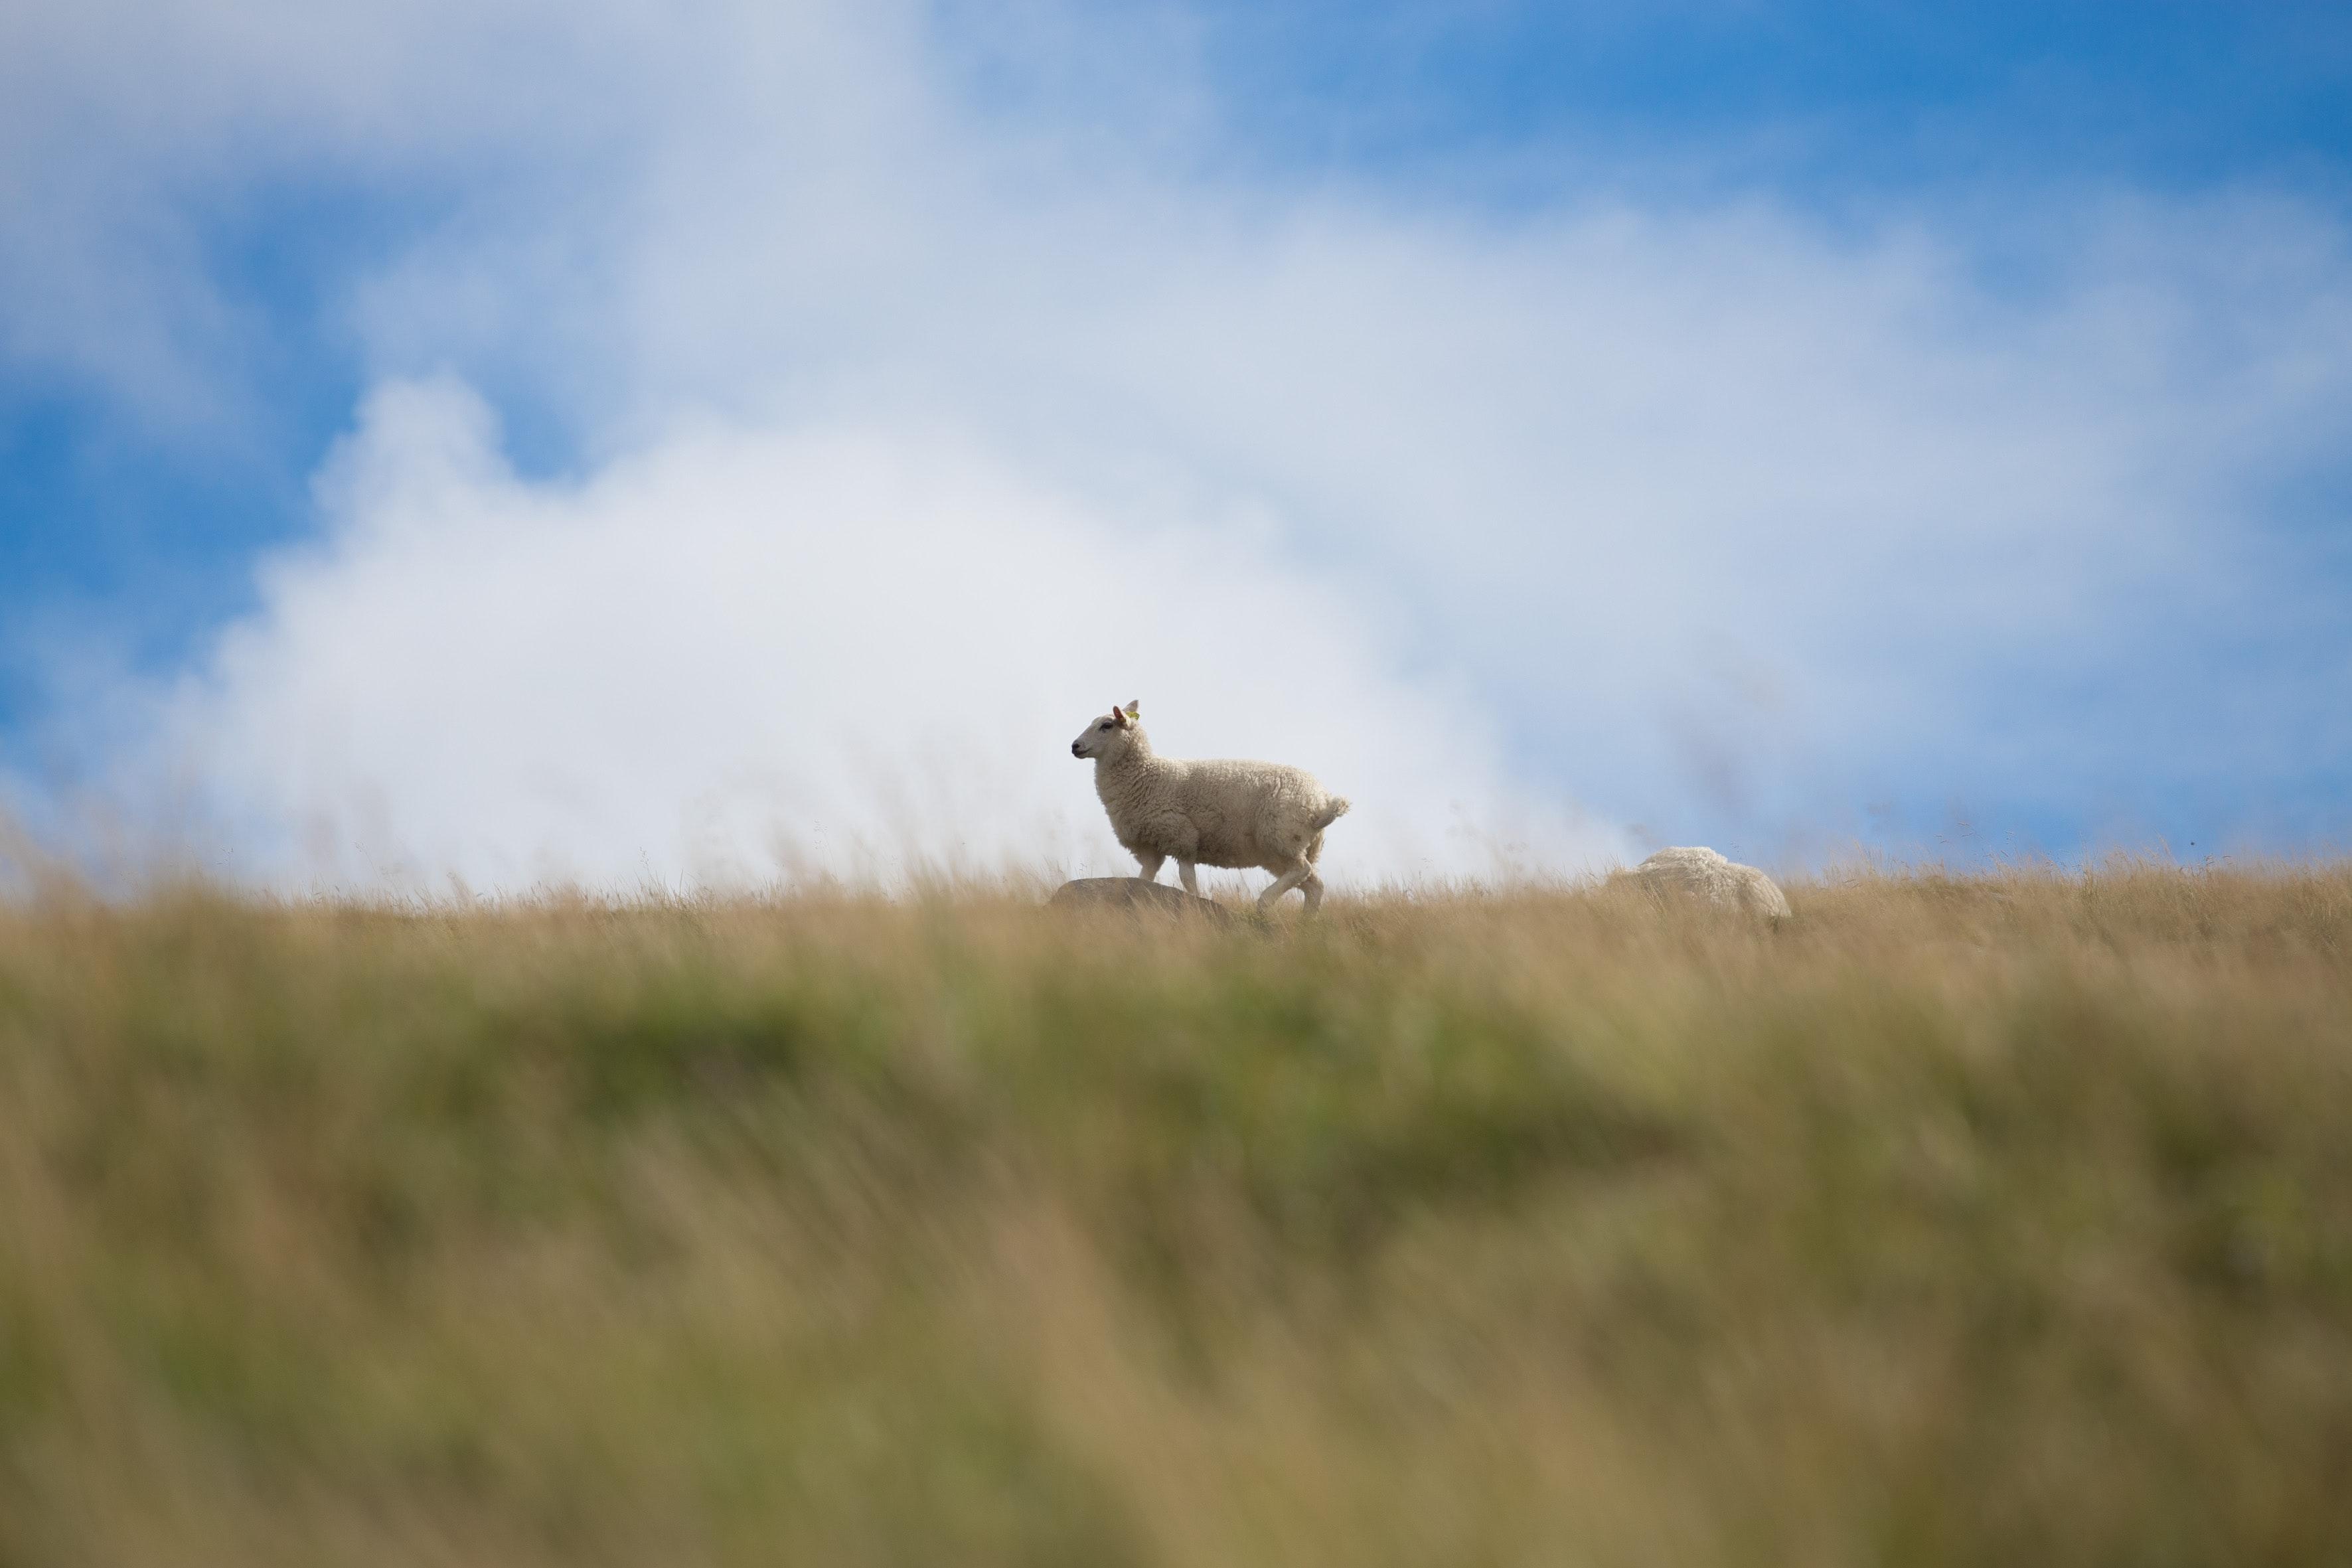 wildlife photography of white lamb